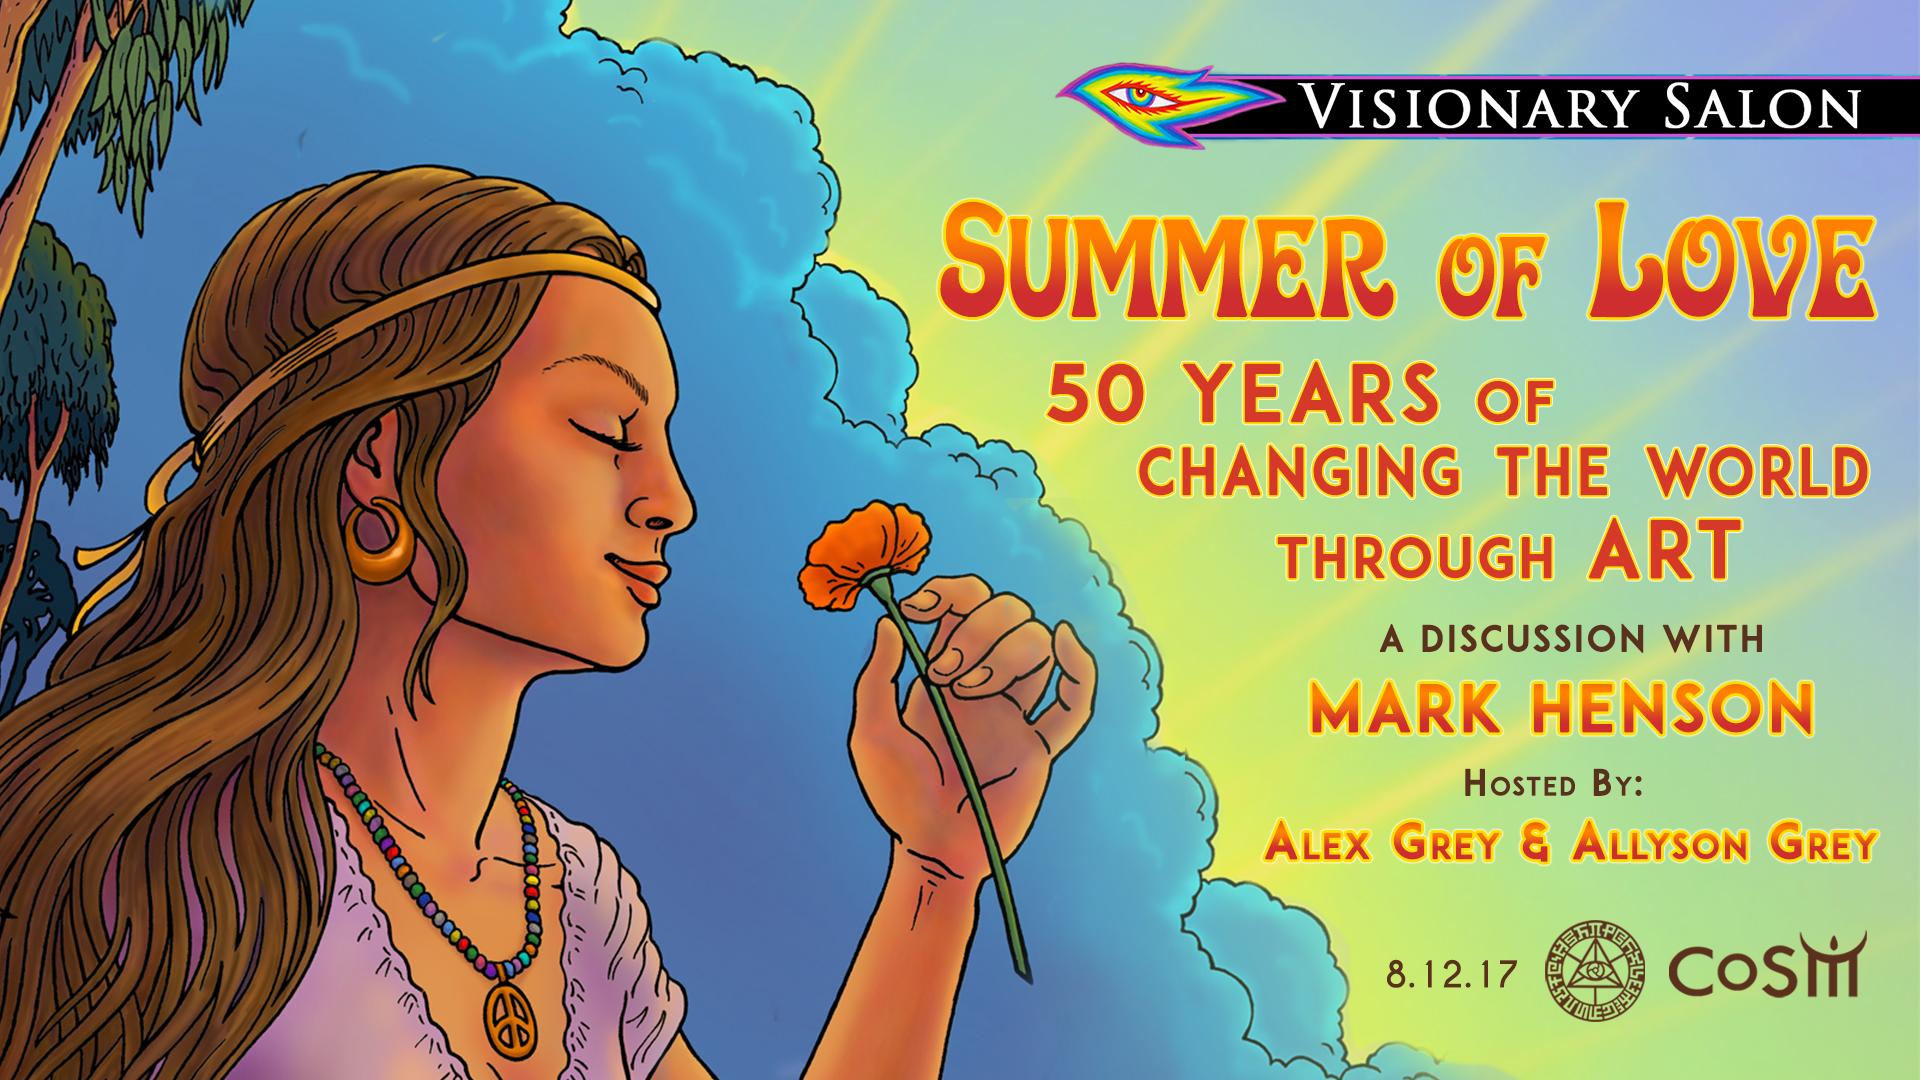 Visionary salon summer of love with mark henson alex for A visionary salon